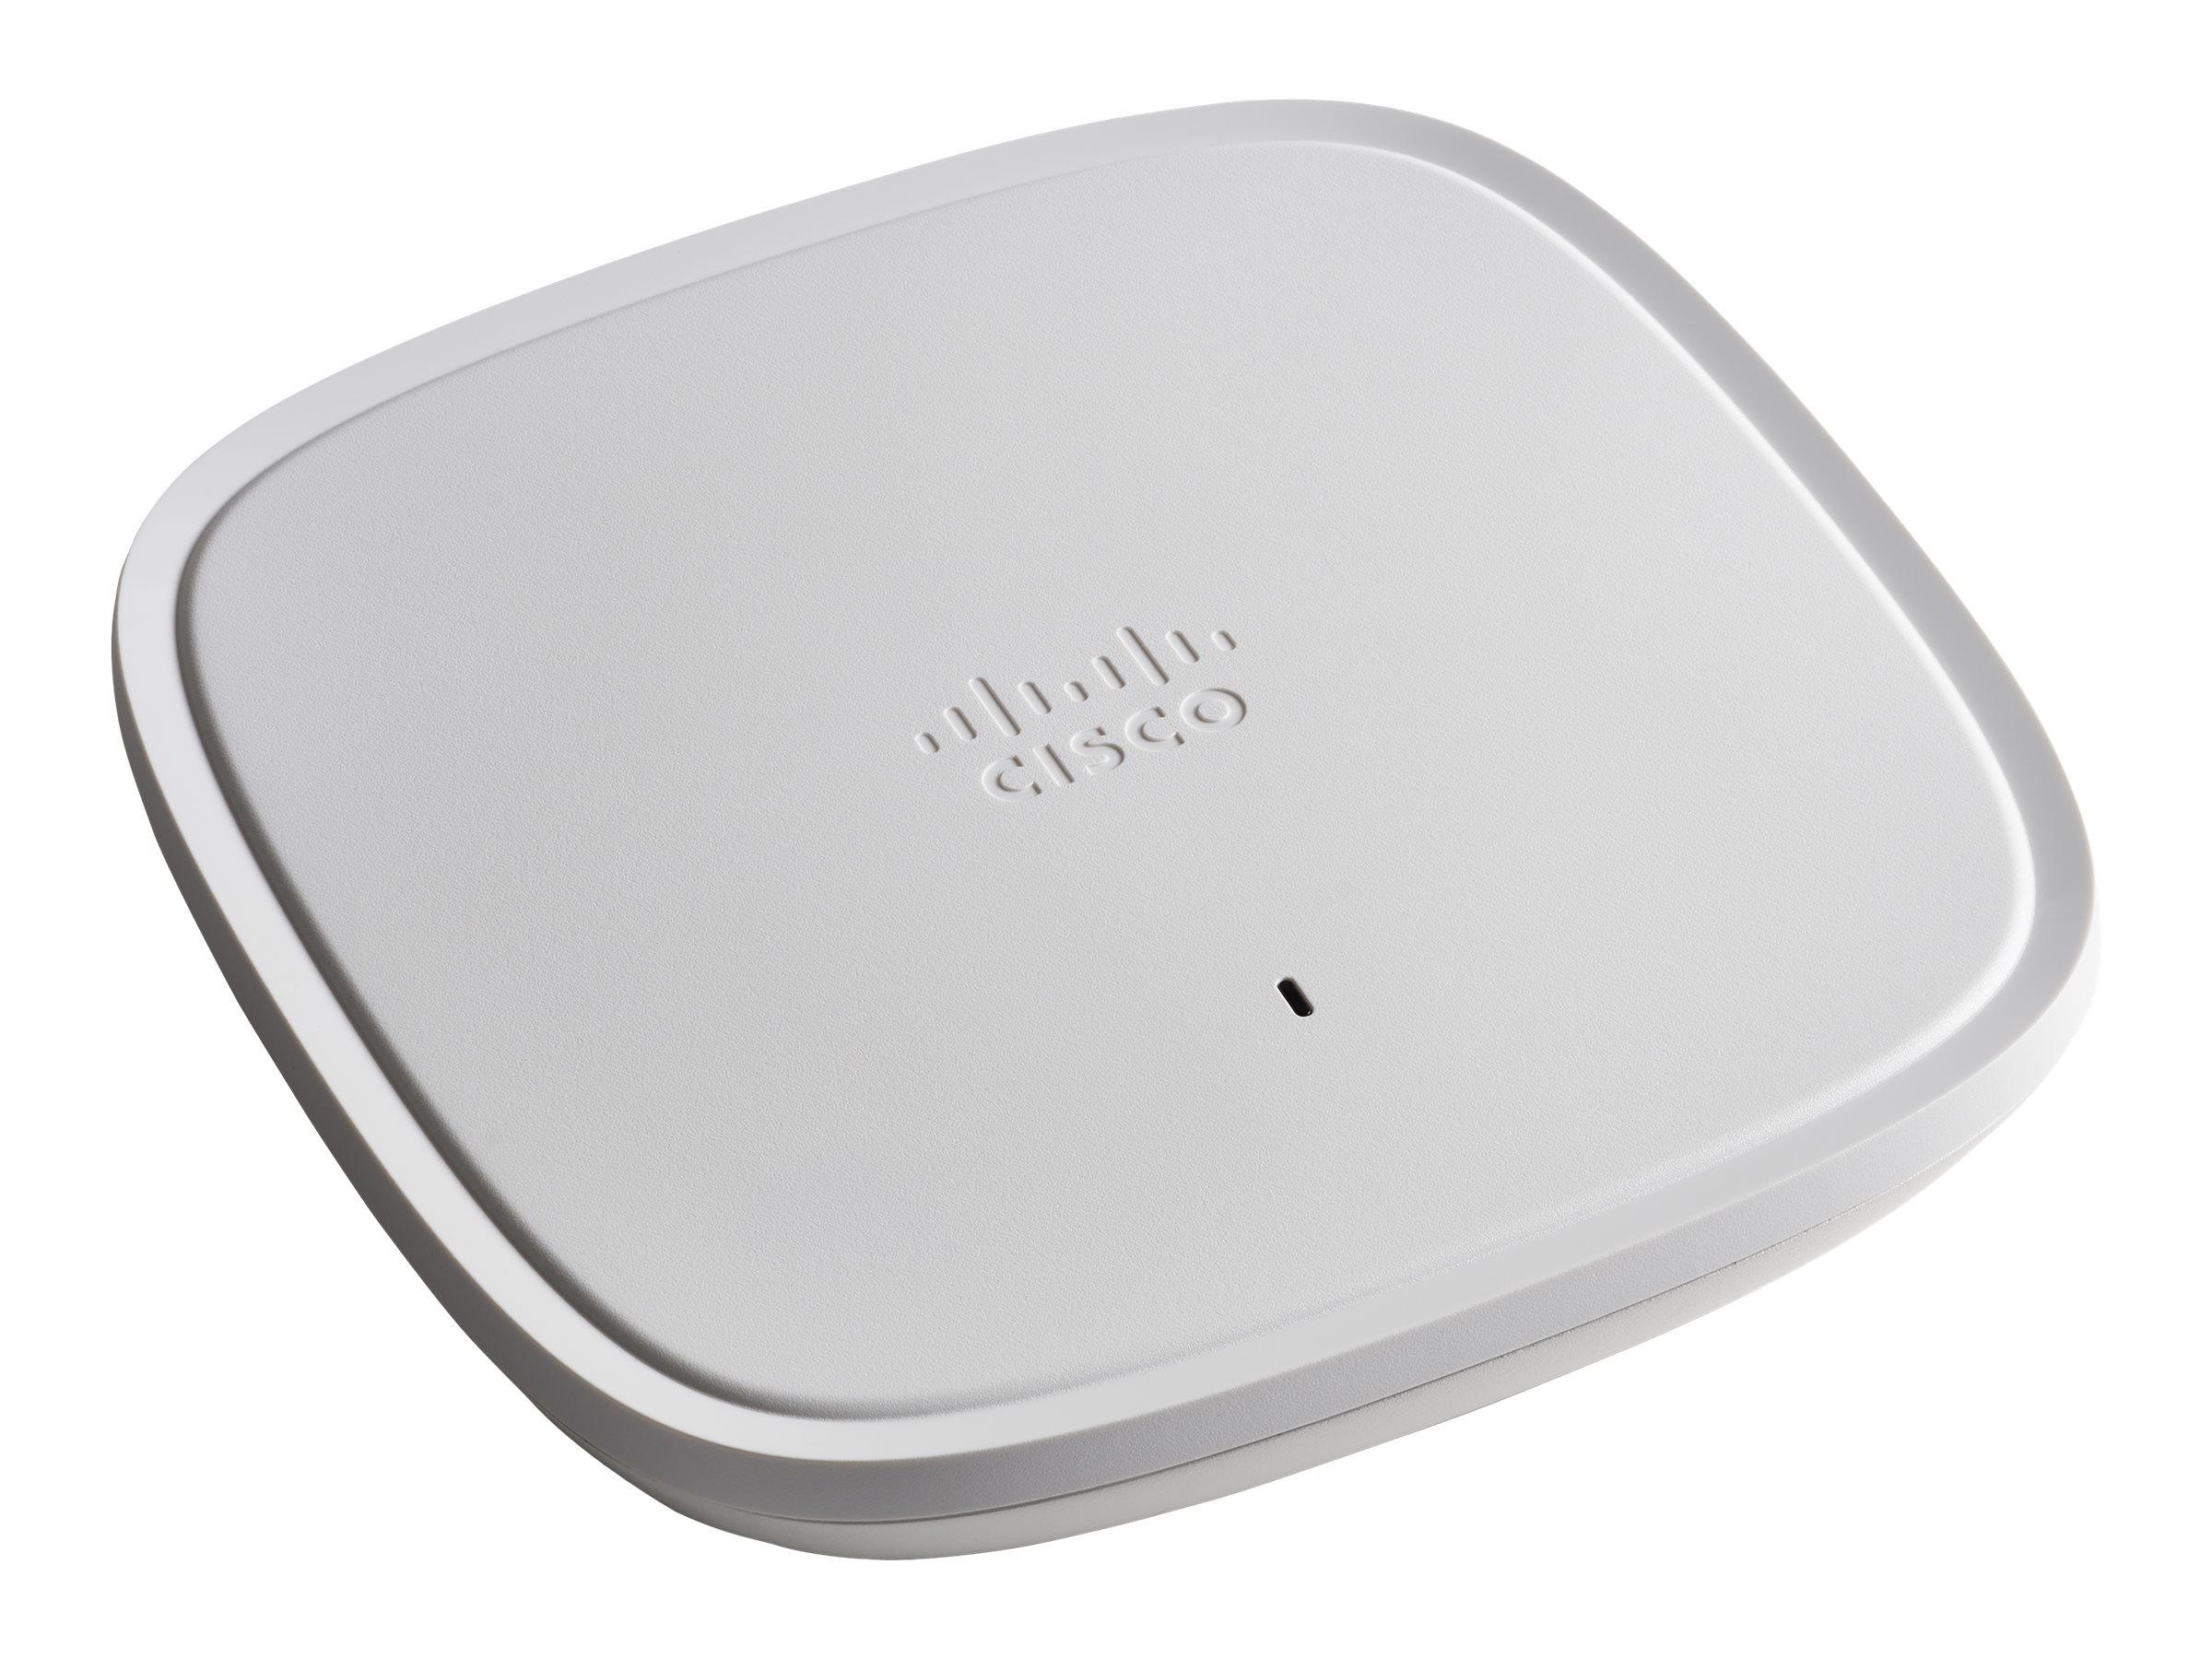 Cisco Catalyst 9117AXI - Funkbasisstation - 802.11ac Wave 2, 802.11ax, Bluetooth 5.0 LE - Wi-Fi, Bluetooth - Dualband